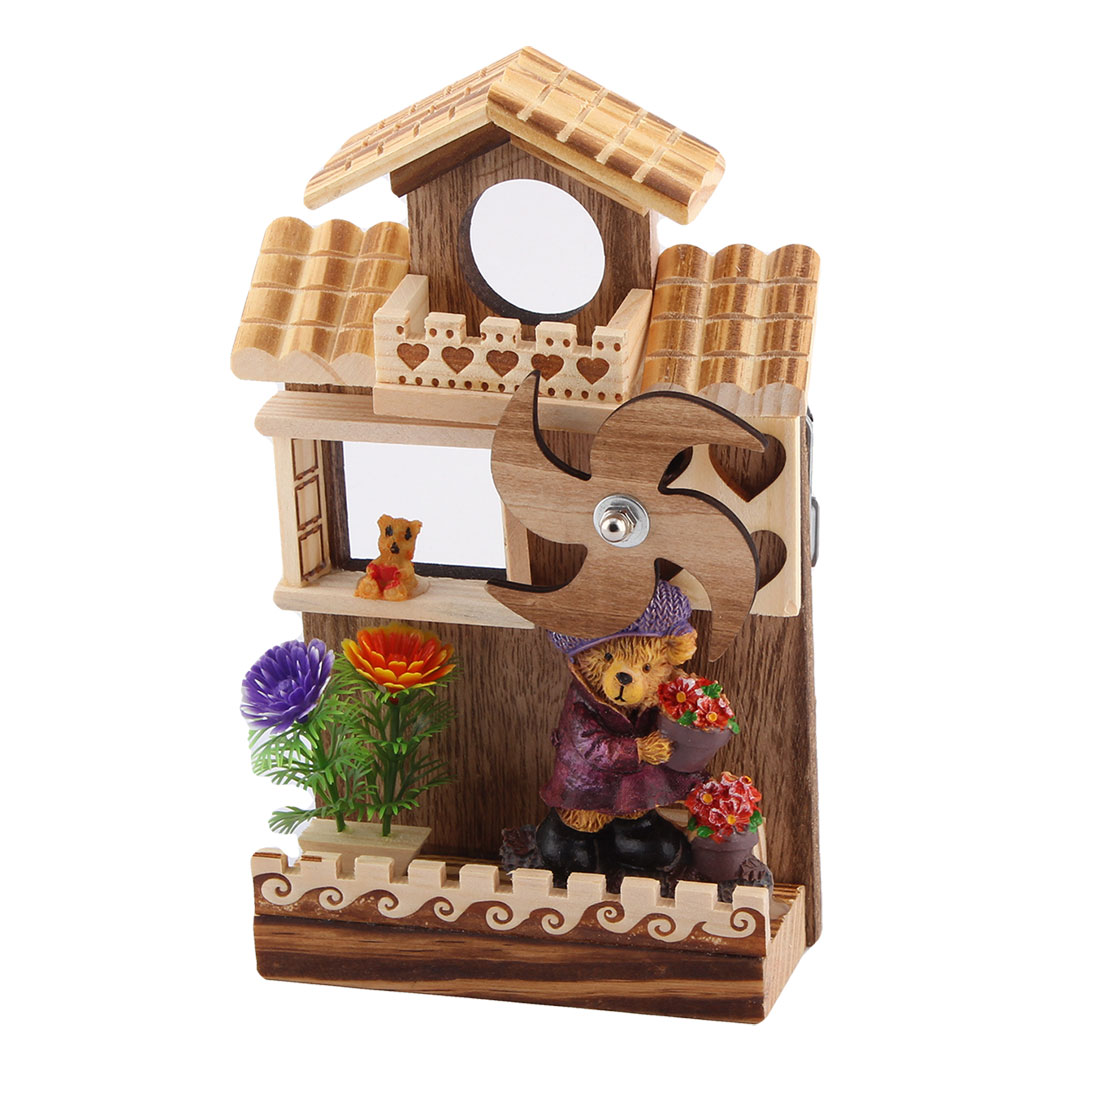 Office Table Wooden Clockwork Rotation Windmill House Decor Handmade Music Box